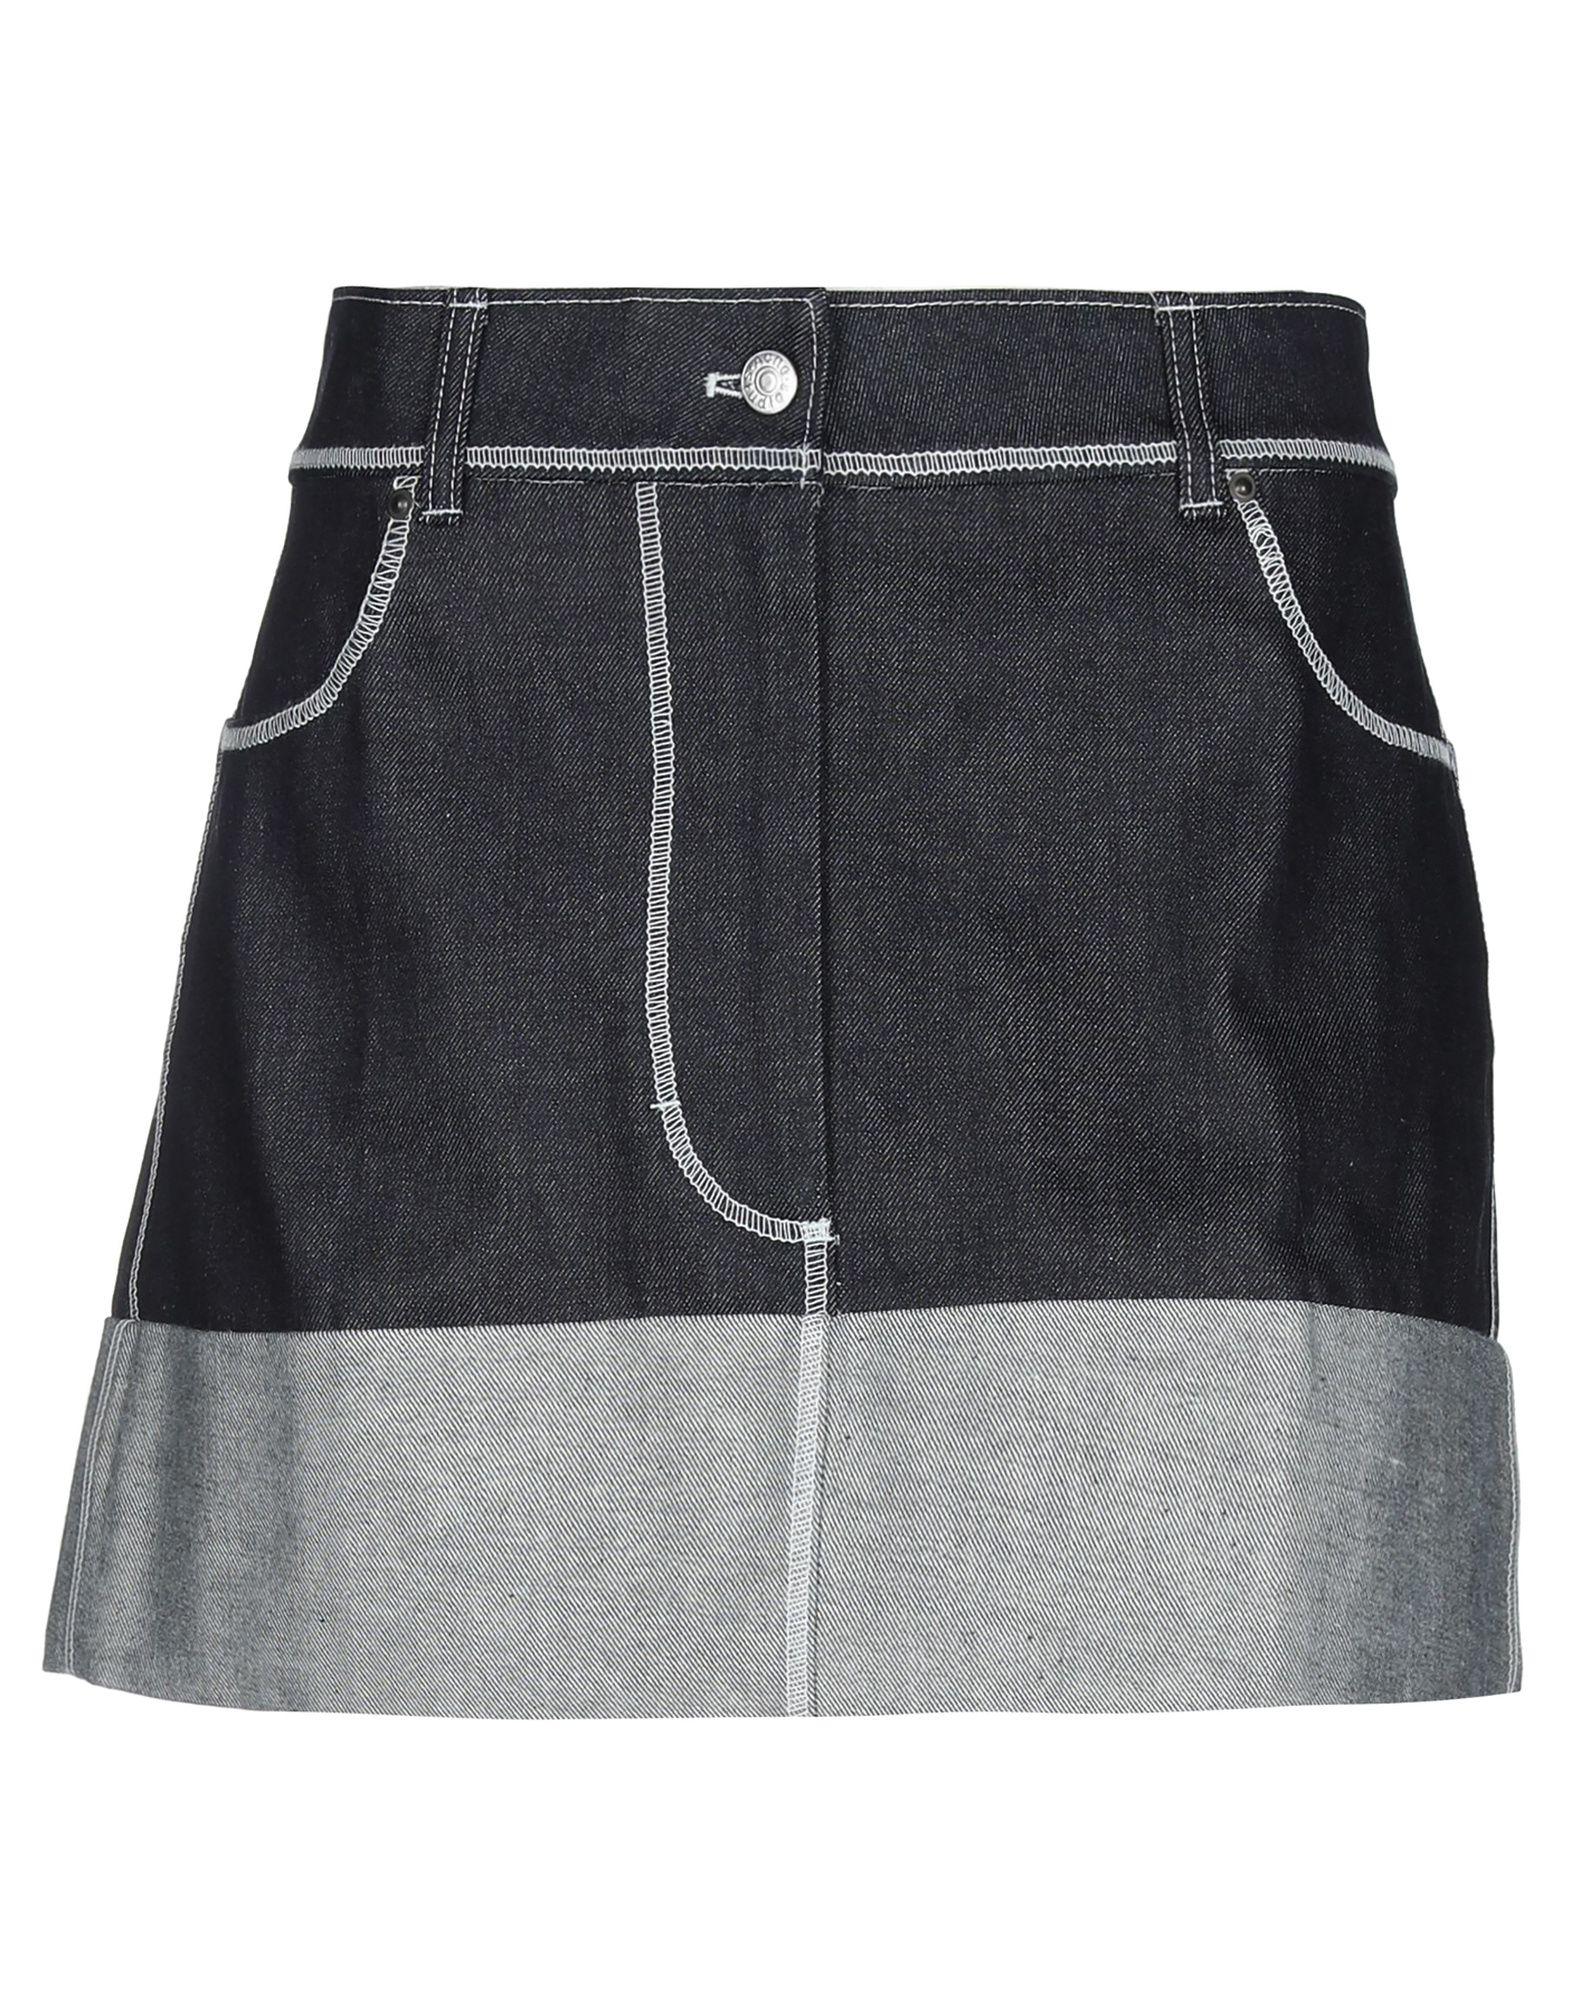 ACNE STUDIOS BLÅ KONST Джинсовая юбка